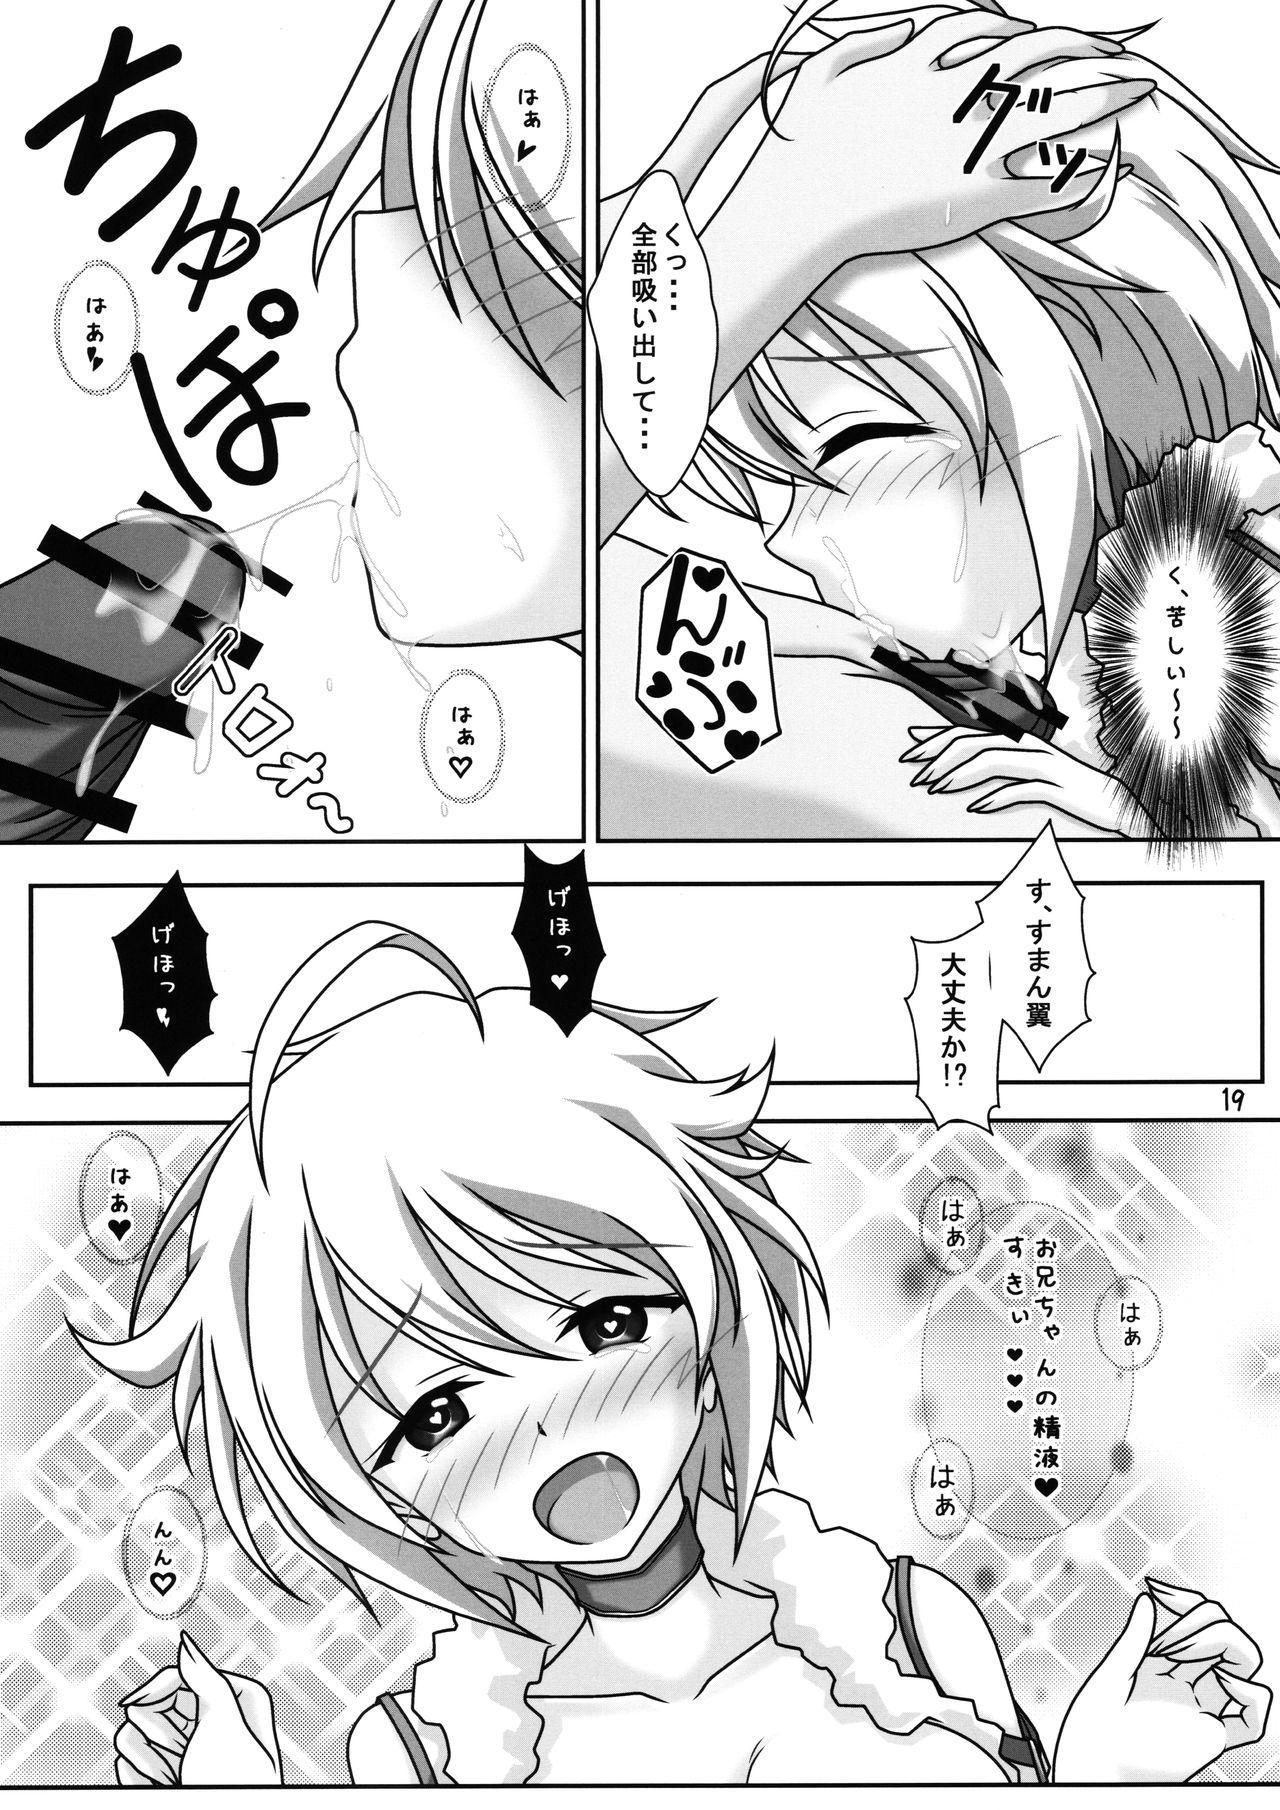 Tsubasa-chan to Ai no Lesson 17